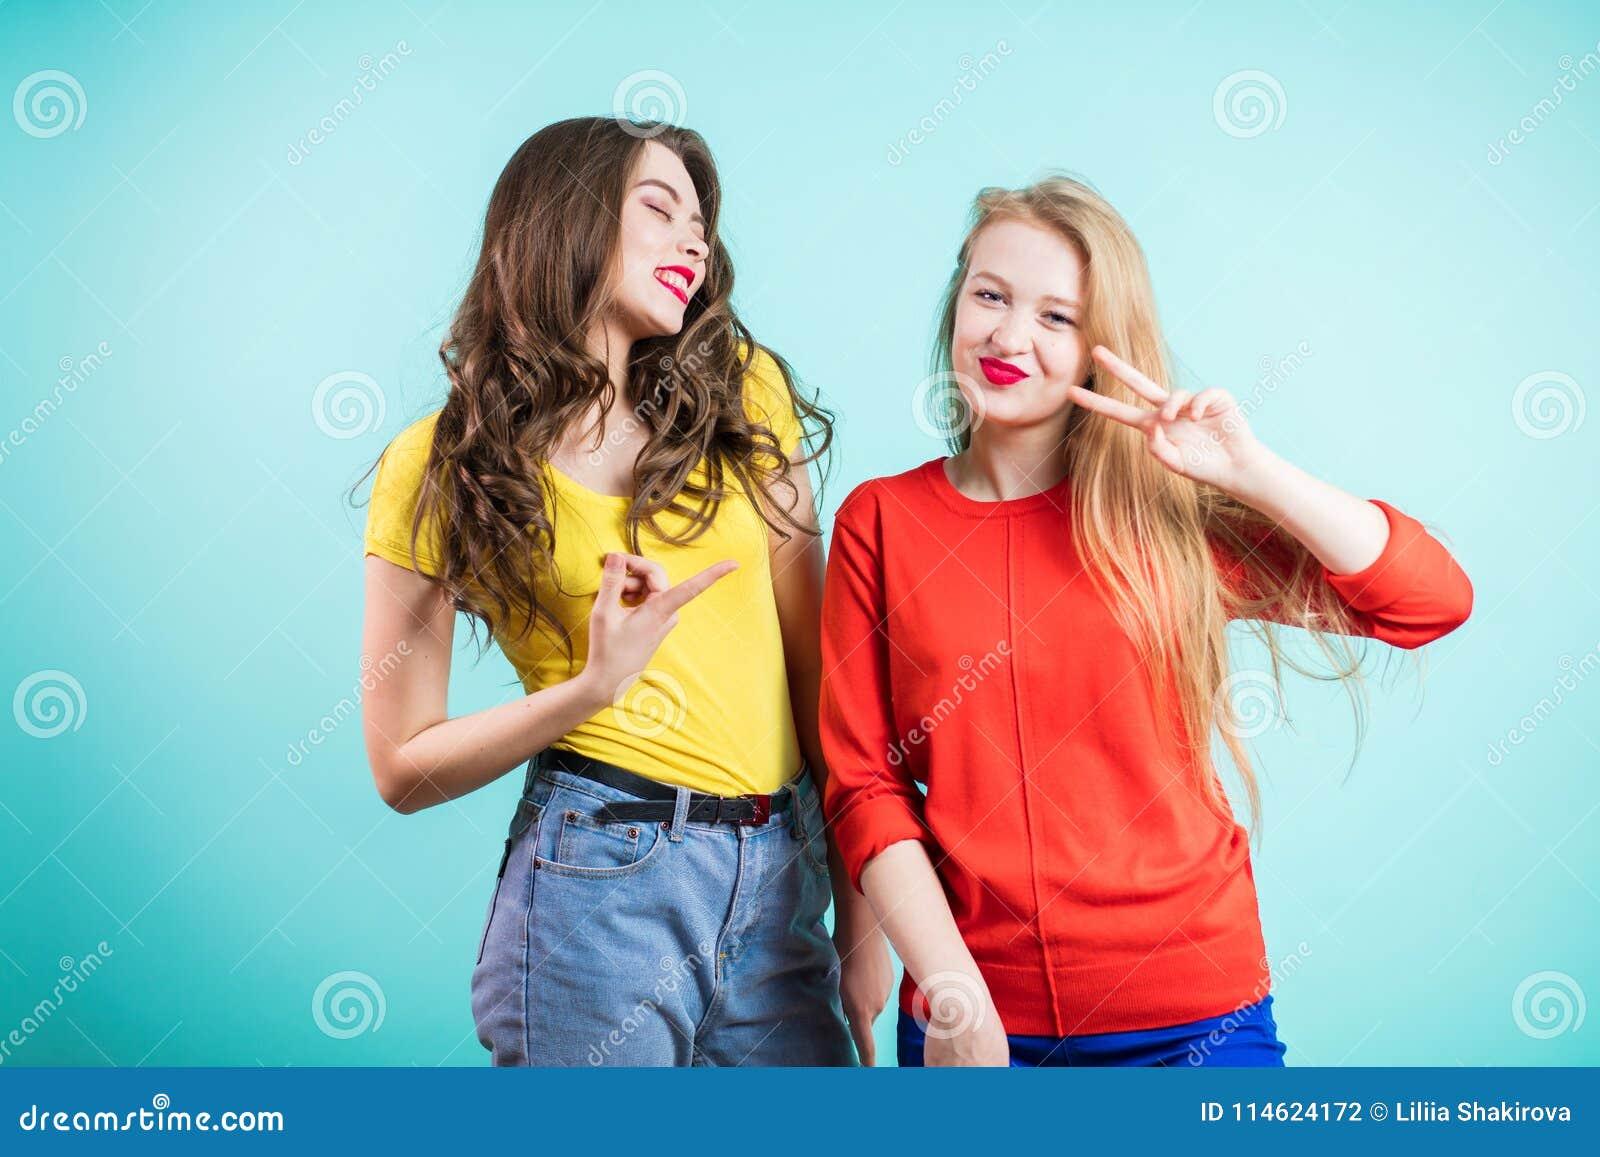 Two young joyful women on blue background. Youth, happiness, fashion, friendshi.